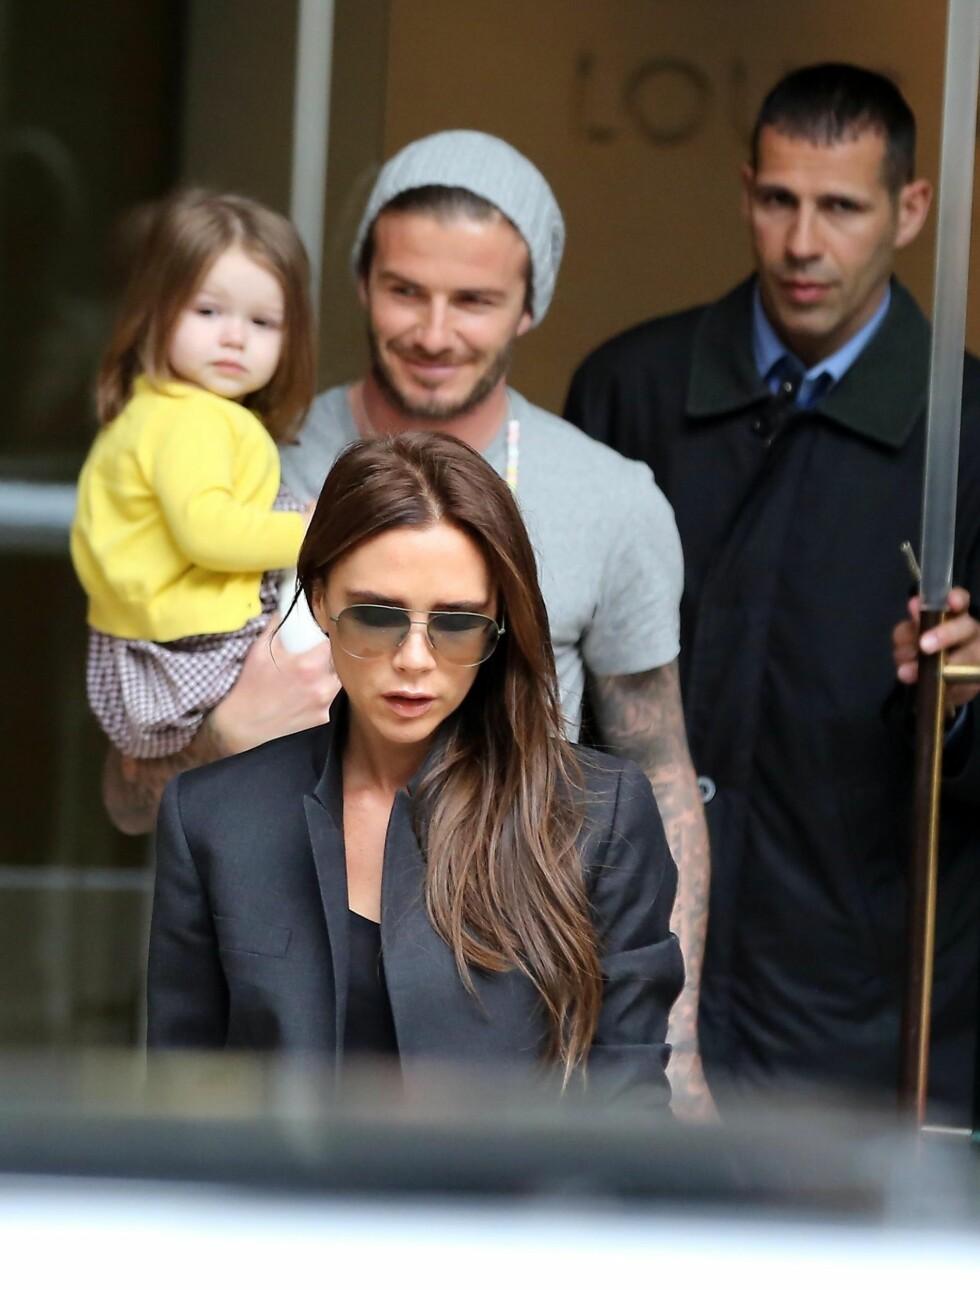 SHOPPING OG LUNSJ: Lille Harper koste seg i pappas armkrok da hun var med mamma og pappa på Louis Vuitton og lunsj i Paris.  Foto: FameFlynet Sweden